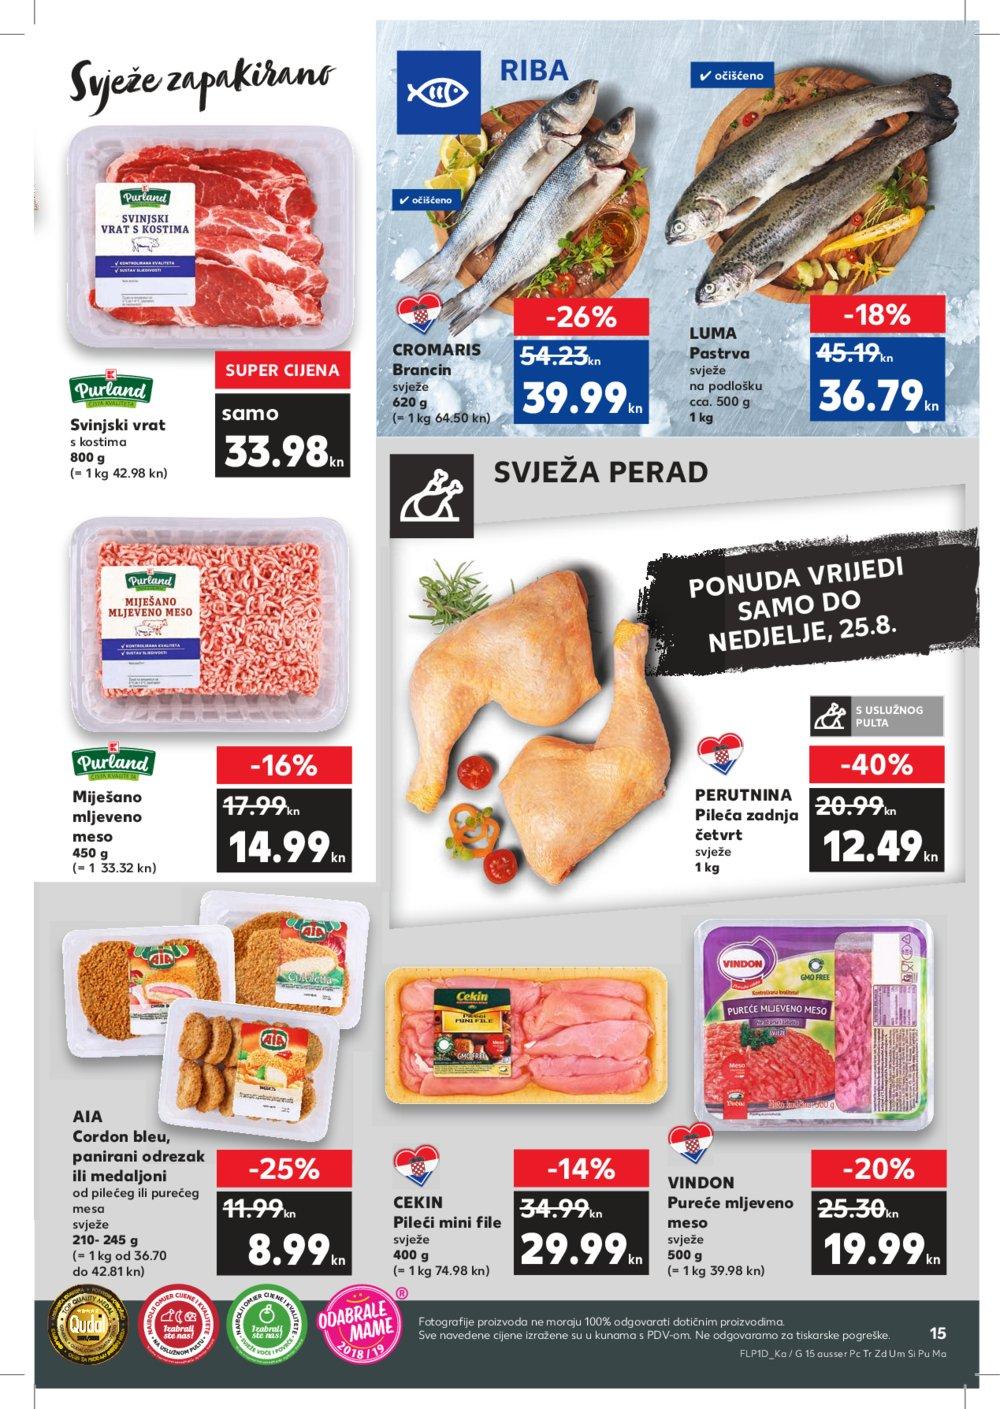 Kaufland katalog Akcija 22.08.-28.08.2019. Đk Ng Os Pž Sb Vin Vir